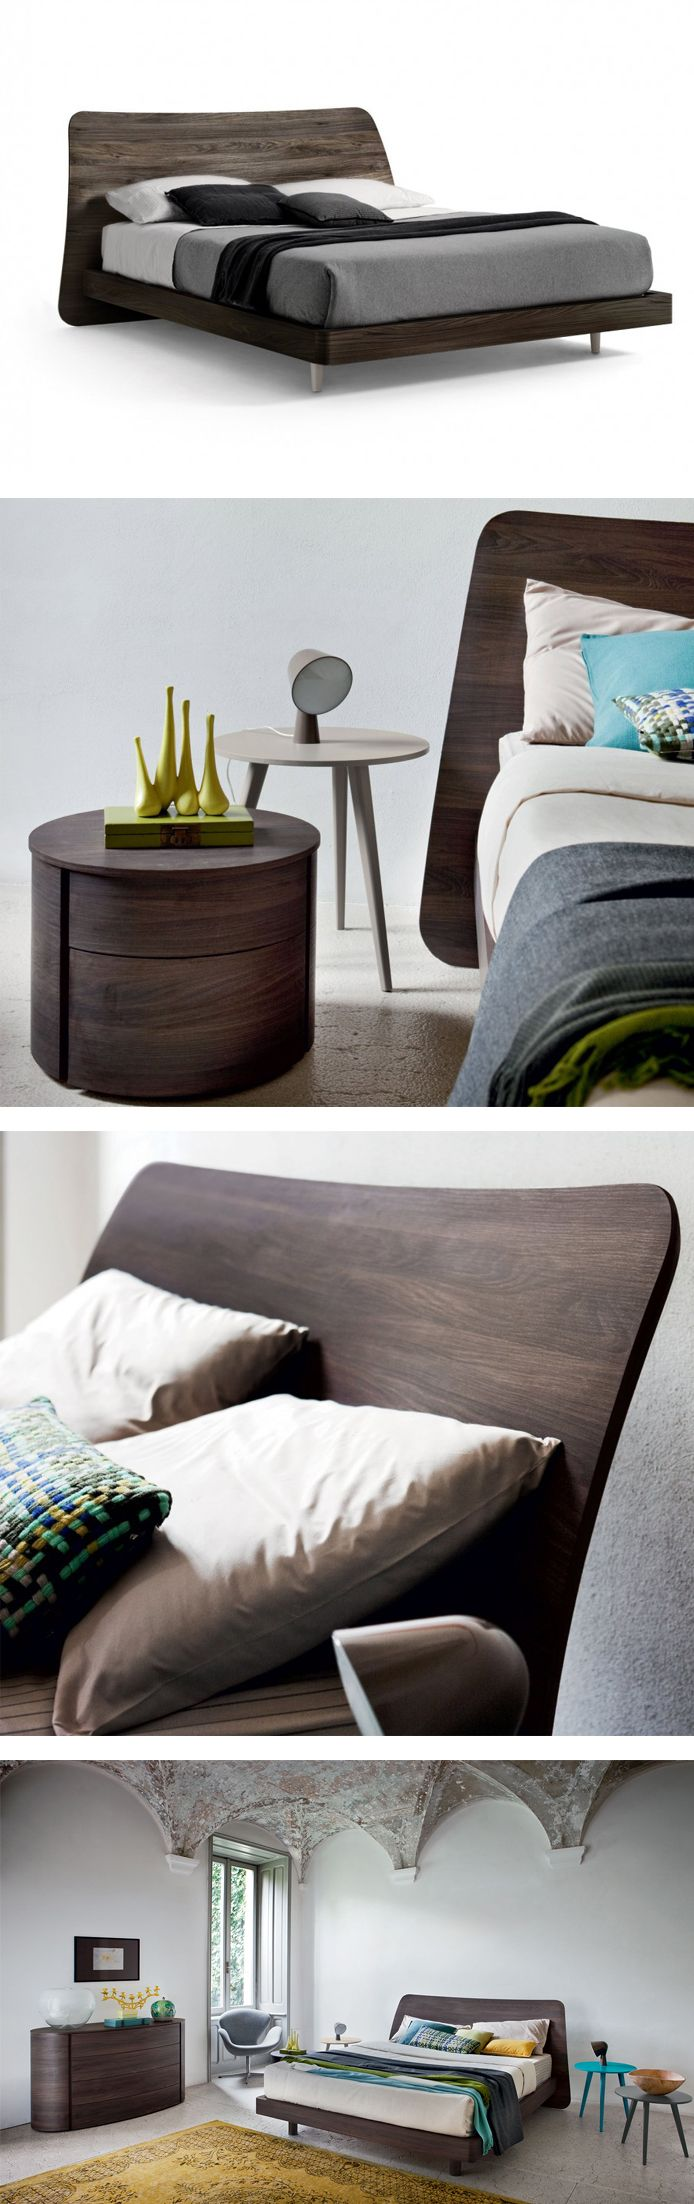 Holzbett modern  Das Design Holzbett Sheet von Novamobili hat ein modern ...